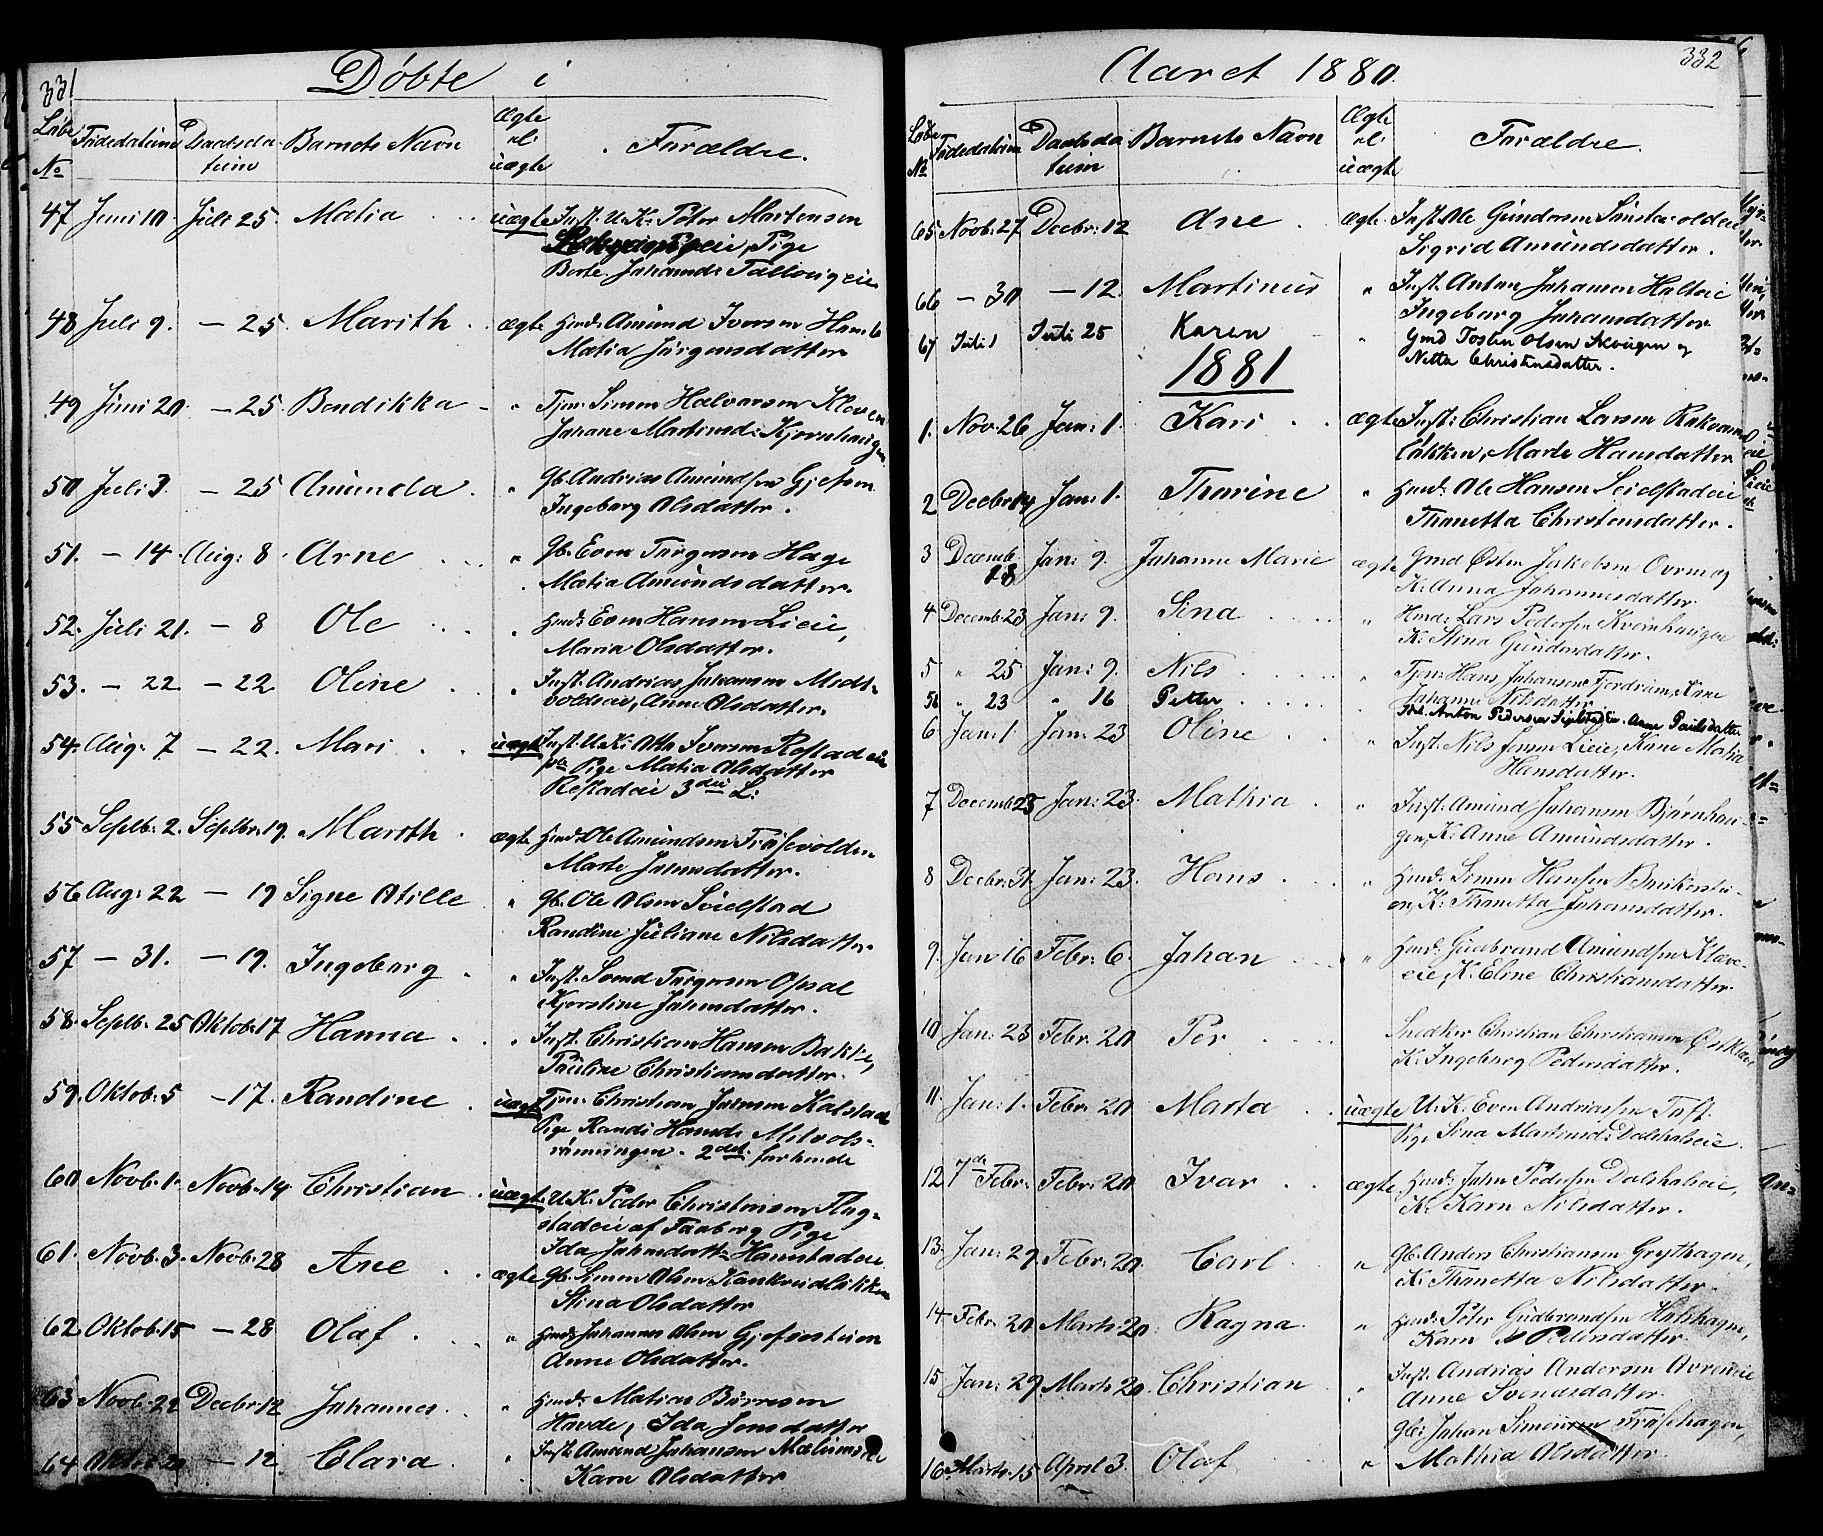 SAH, Østre Gausdal prestekontor, Klokkerbok nr. 1, 1863-1893, s. 331-332